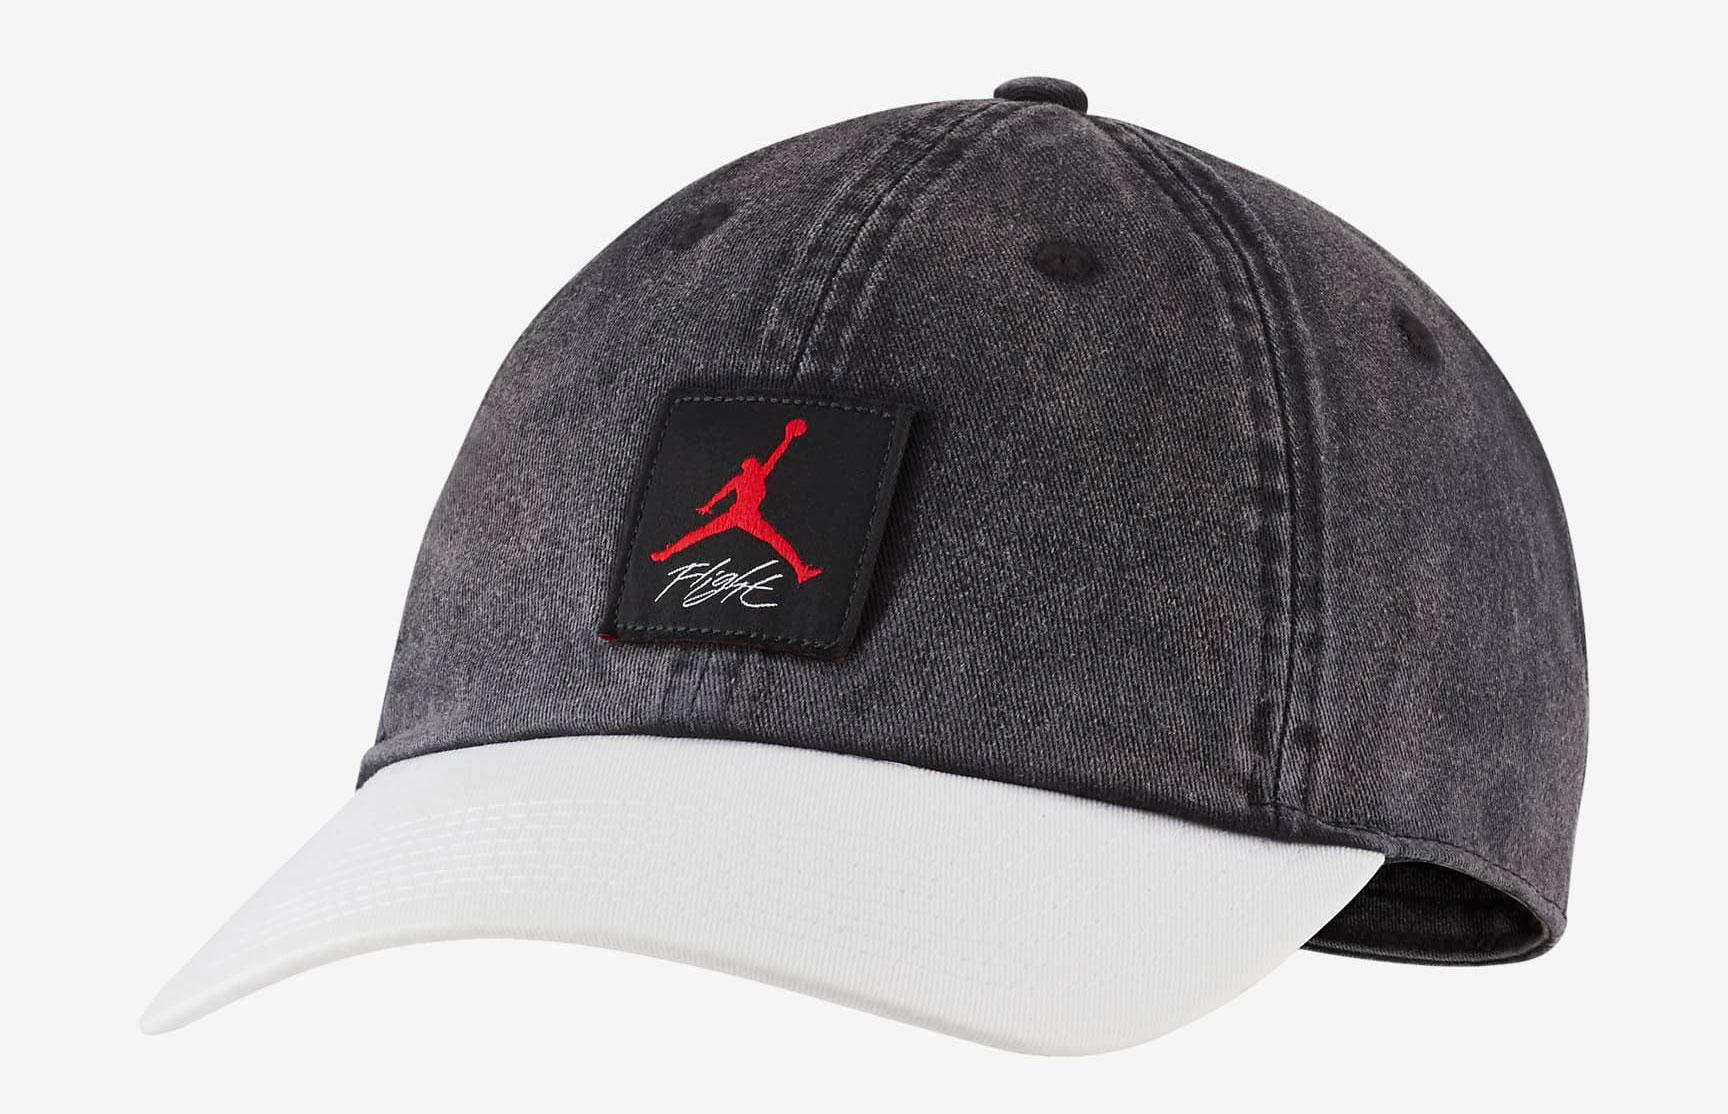 air-jordan-4-fire-red-2020-hat-1